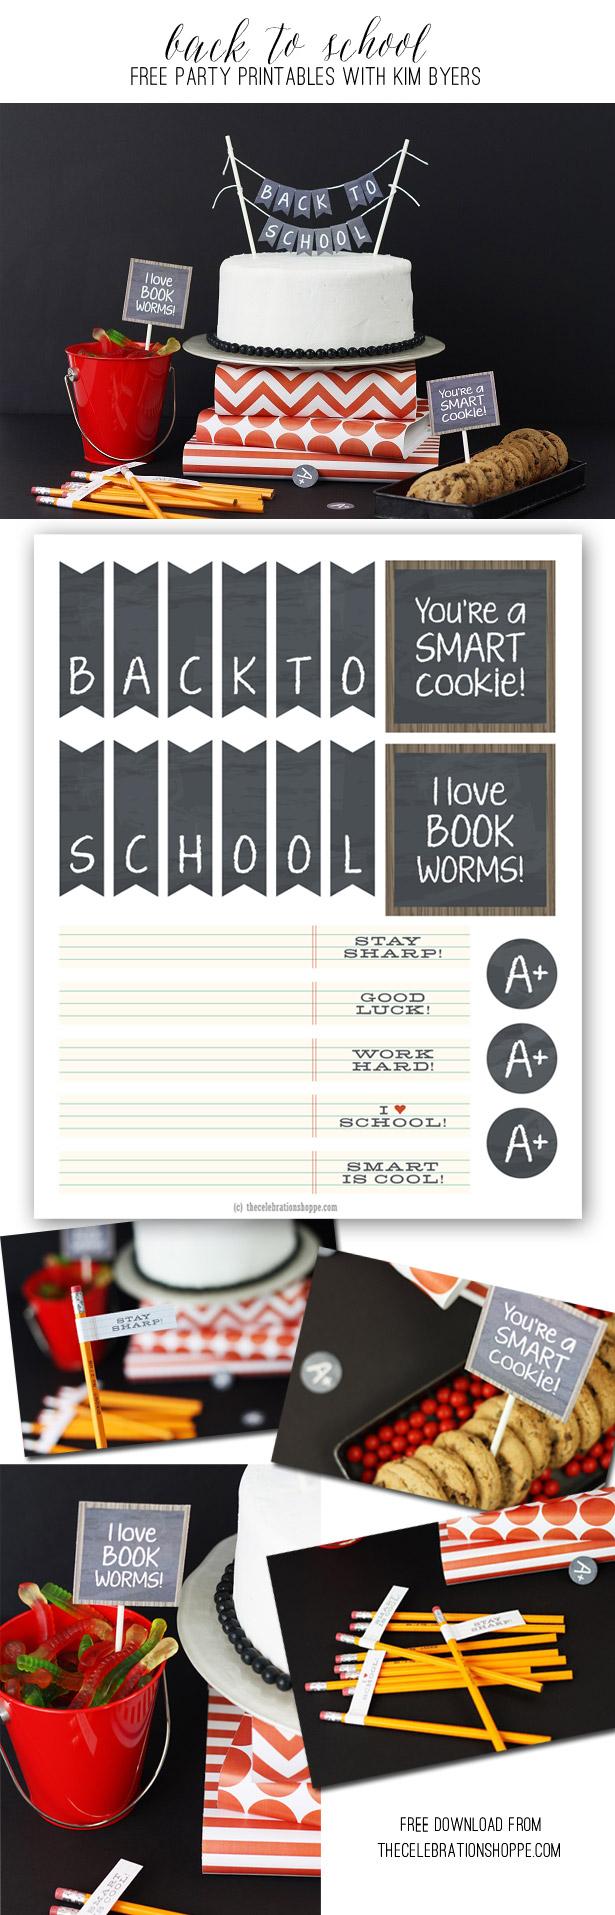 Back To School Party + Free Printables | Kim Byers, TheCelebrationShoppe.com